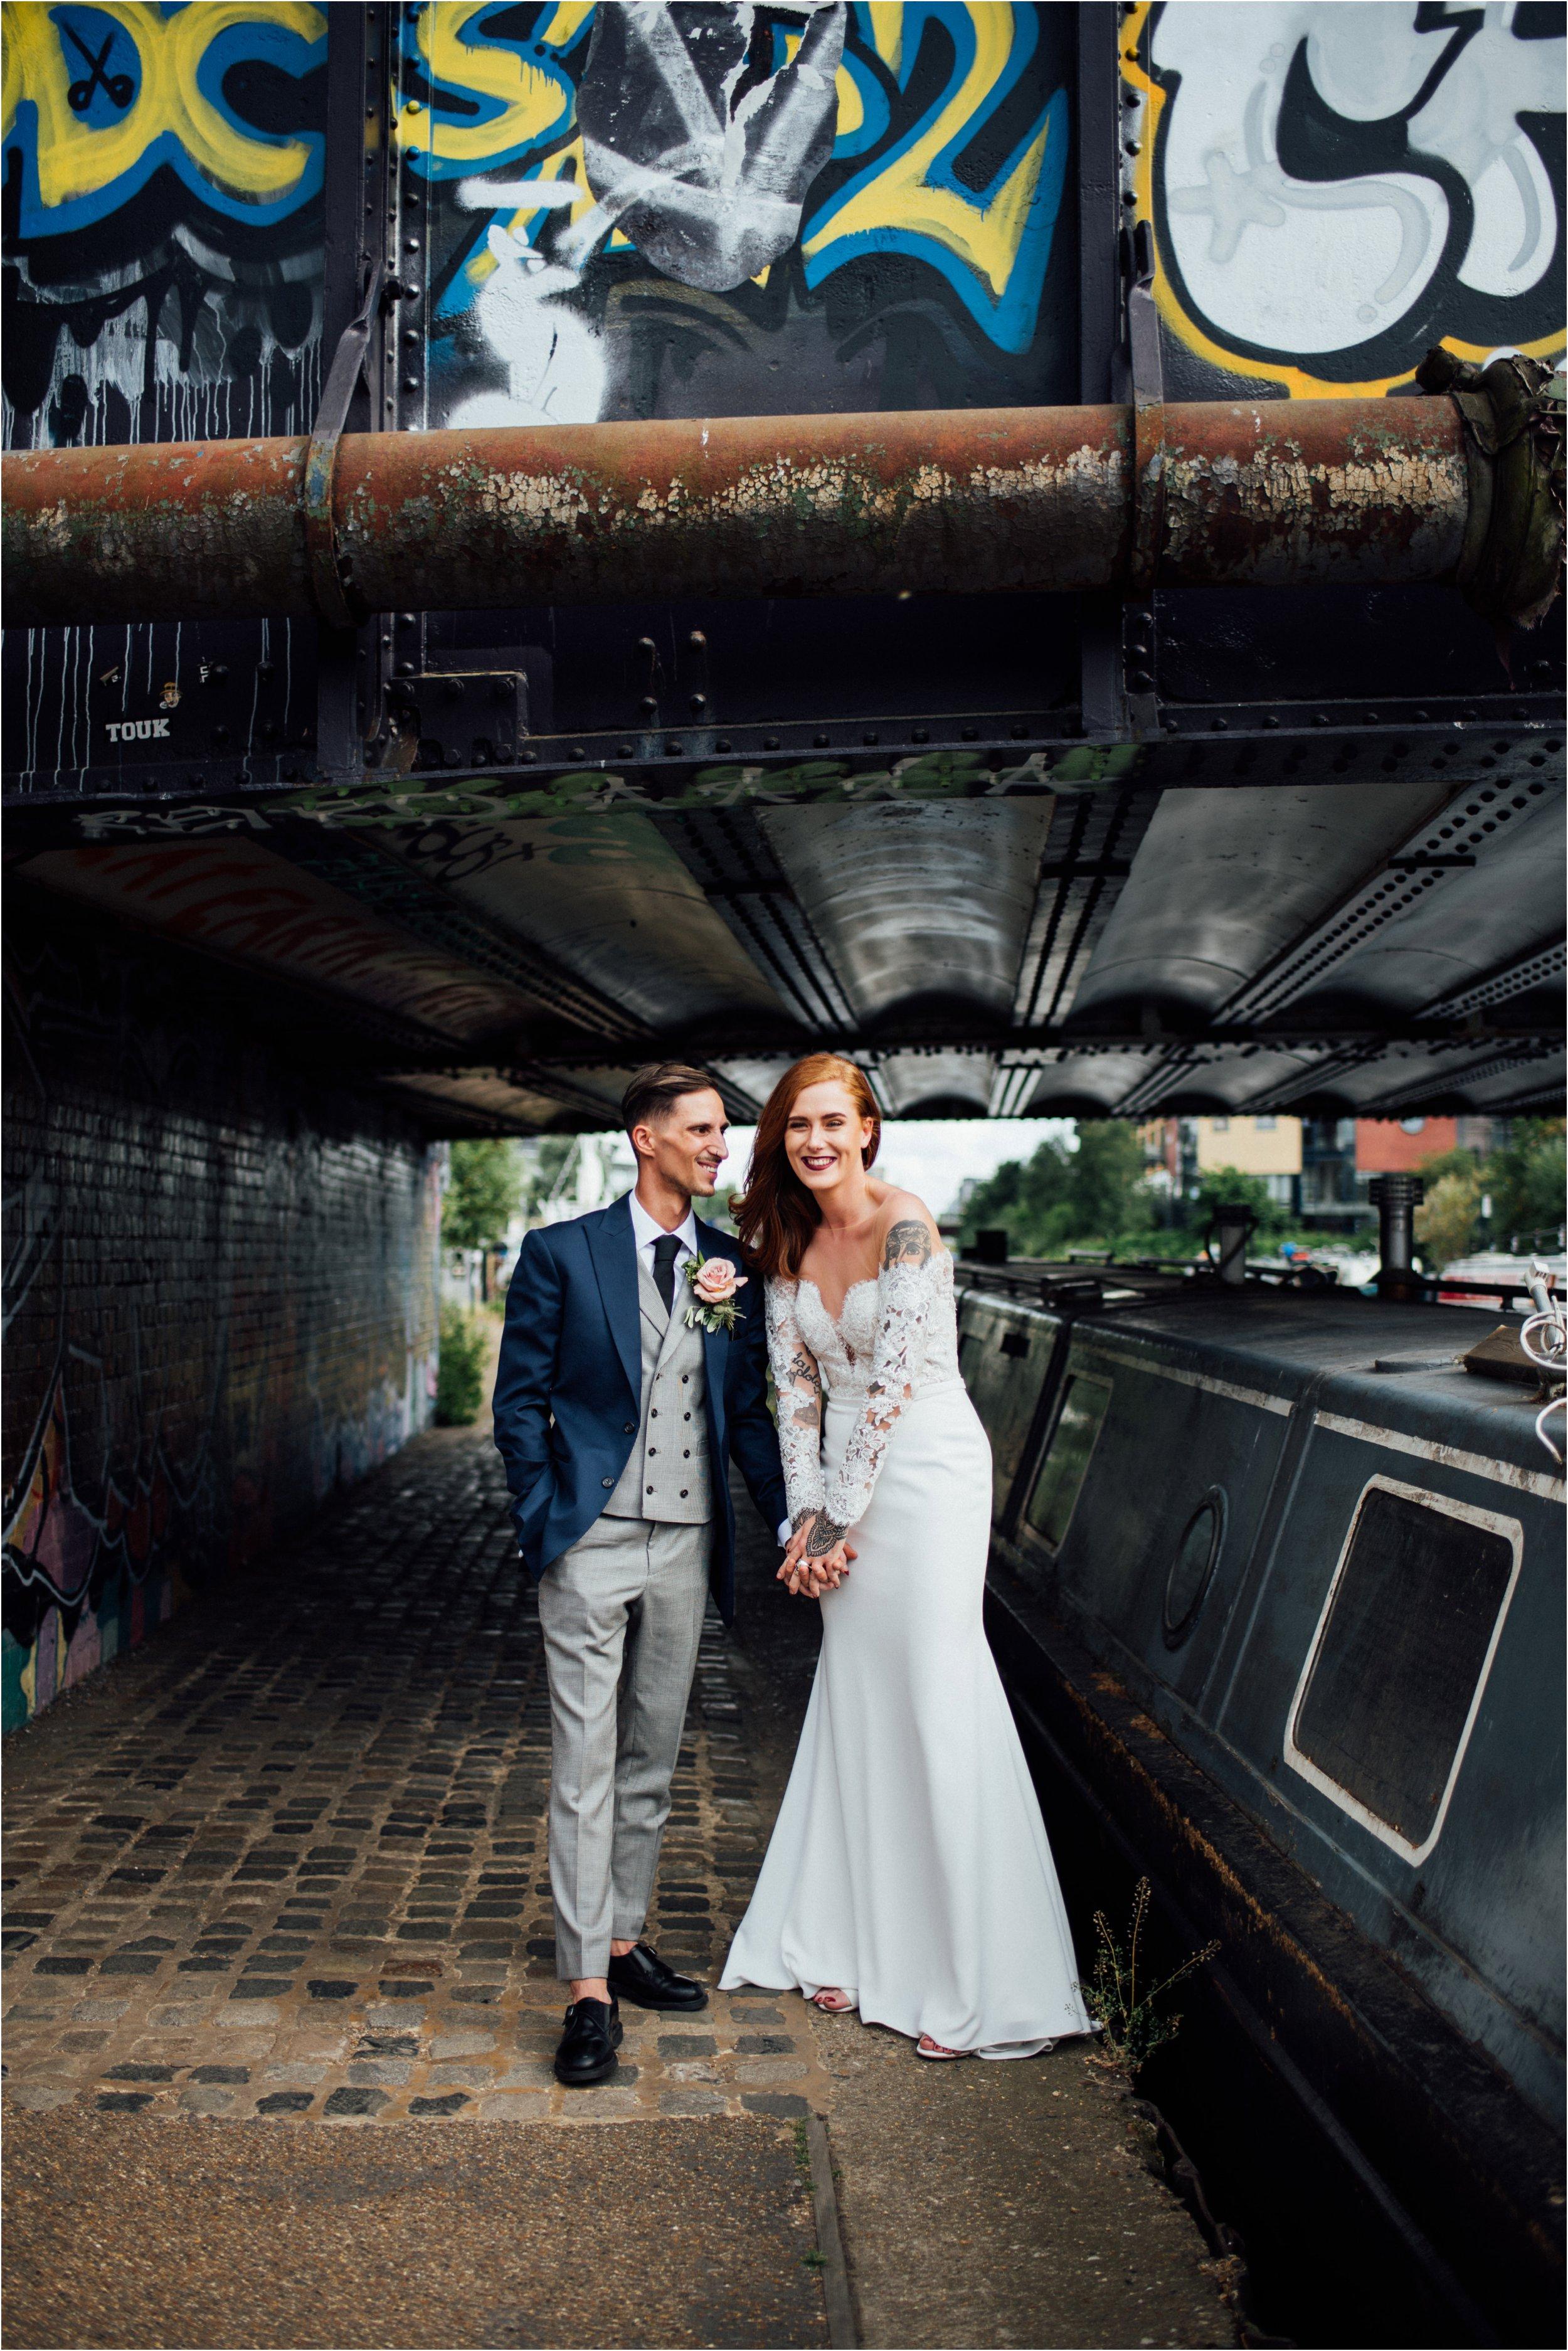 Hackney town hall wedding photography_0140.jpg